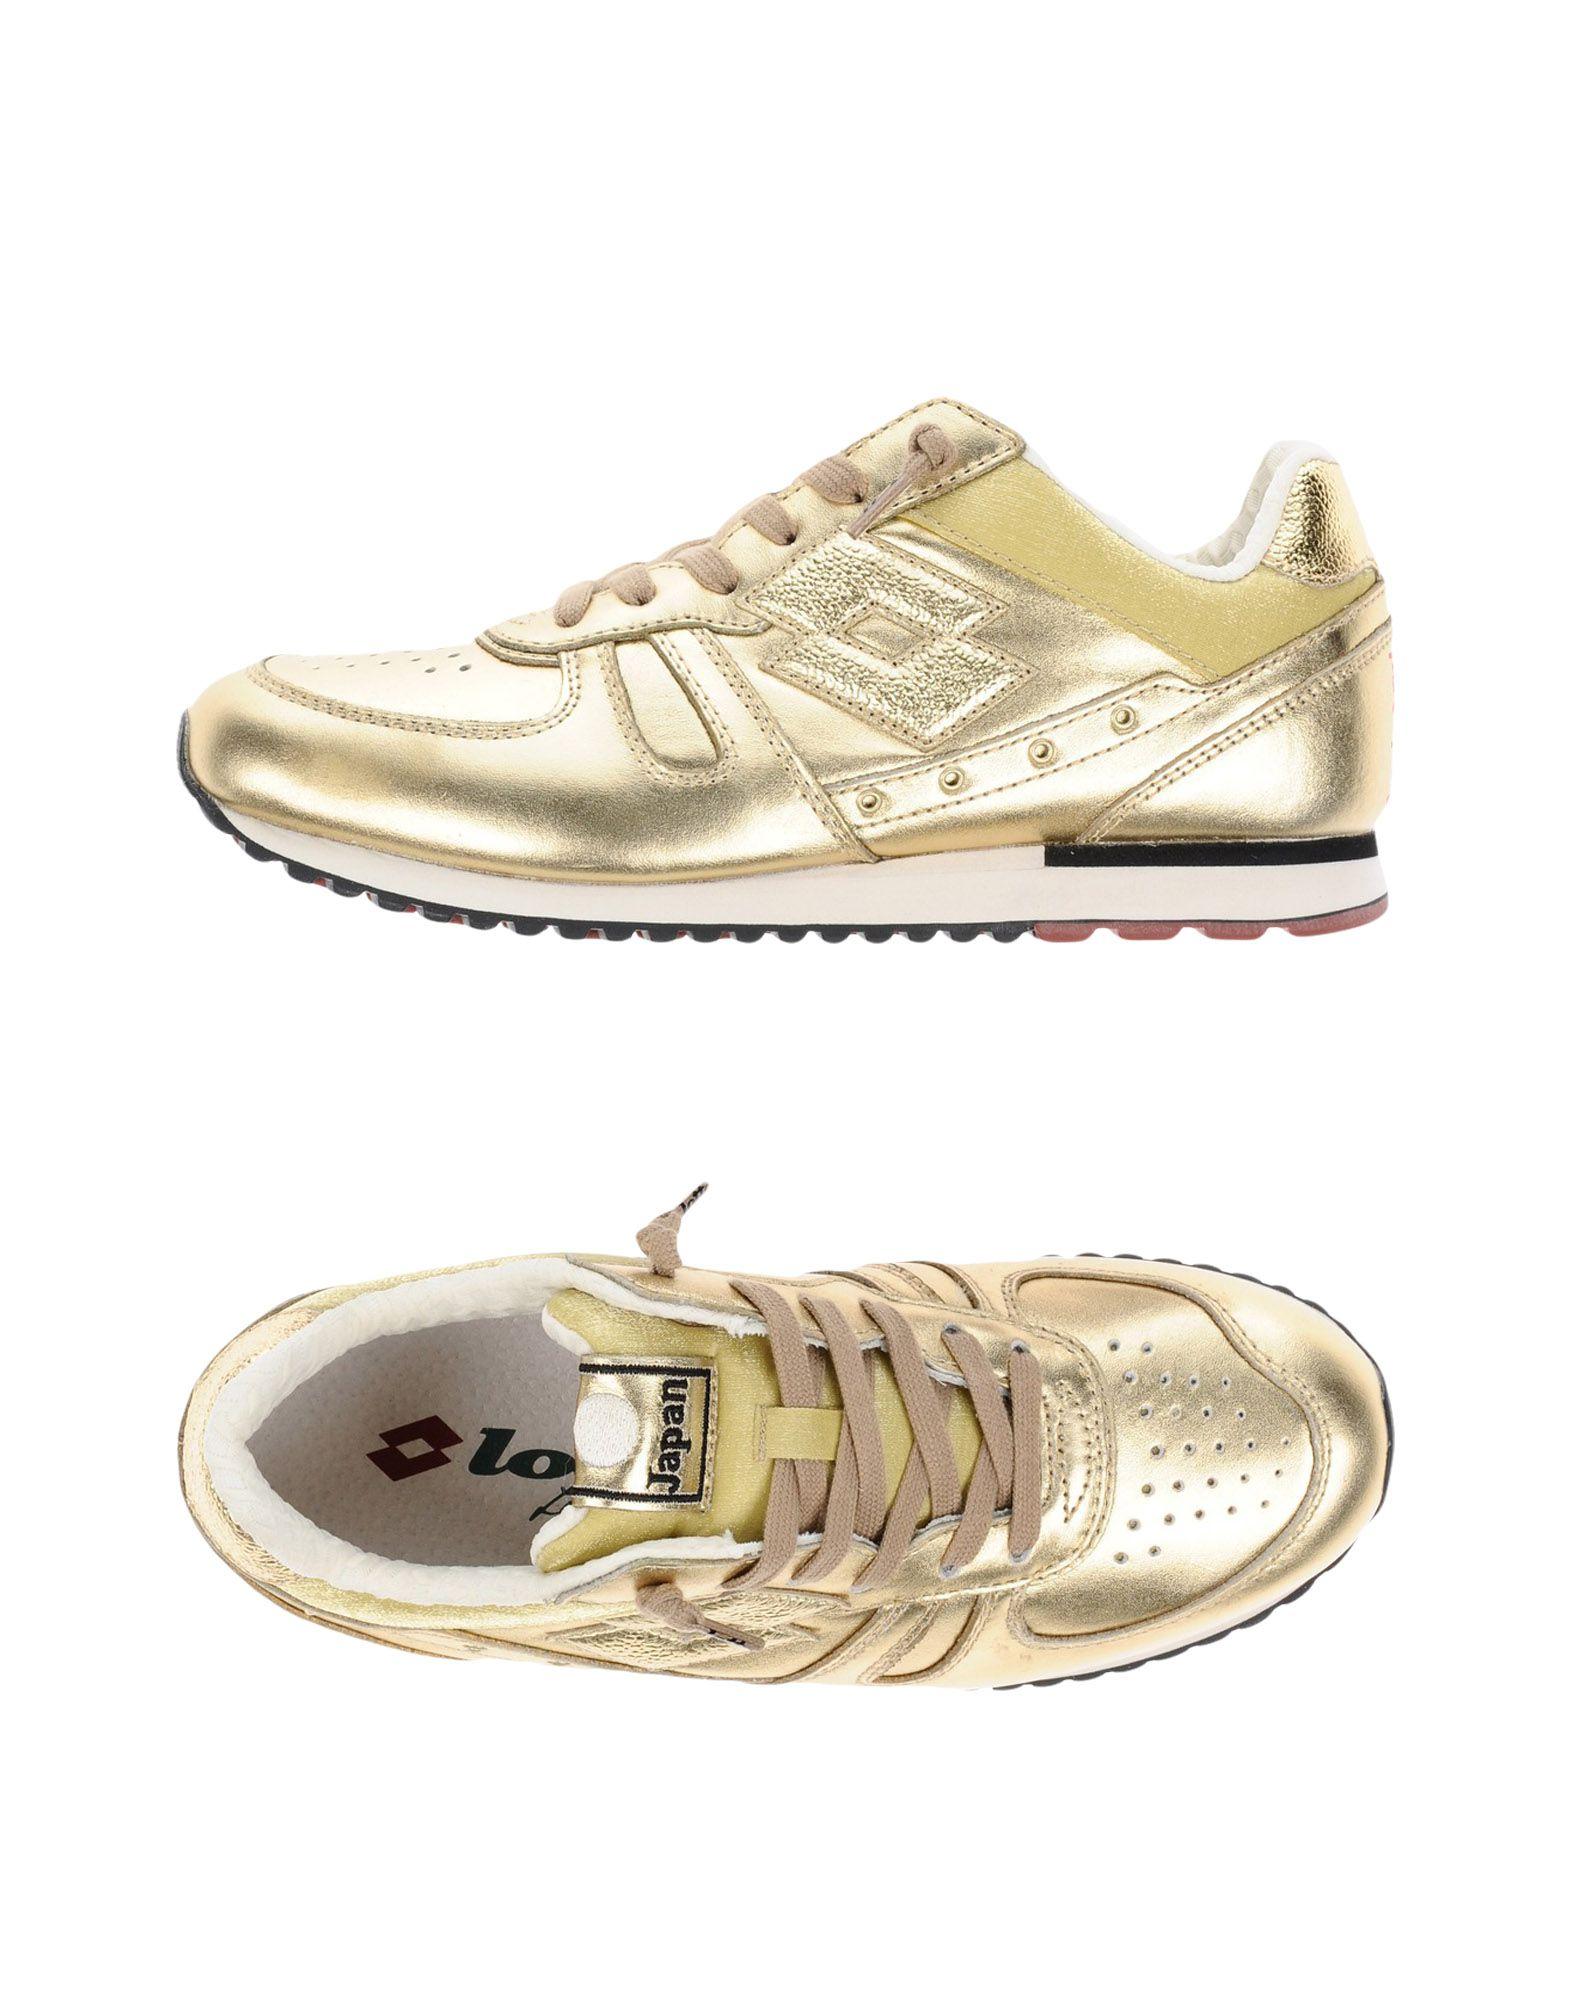 Lotto Leggenda Sneakers Damen  11260371MJ Gute Qualität beliebte Schuhe